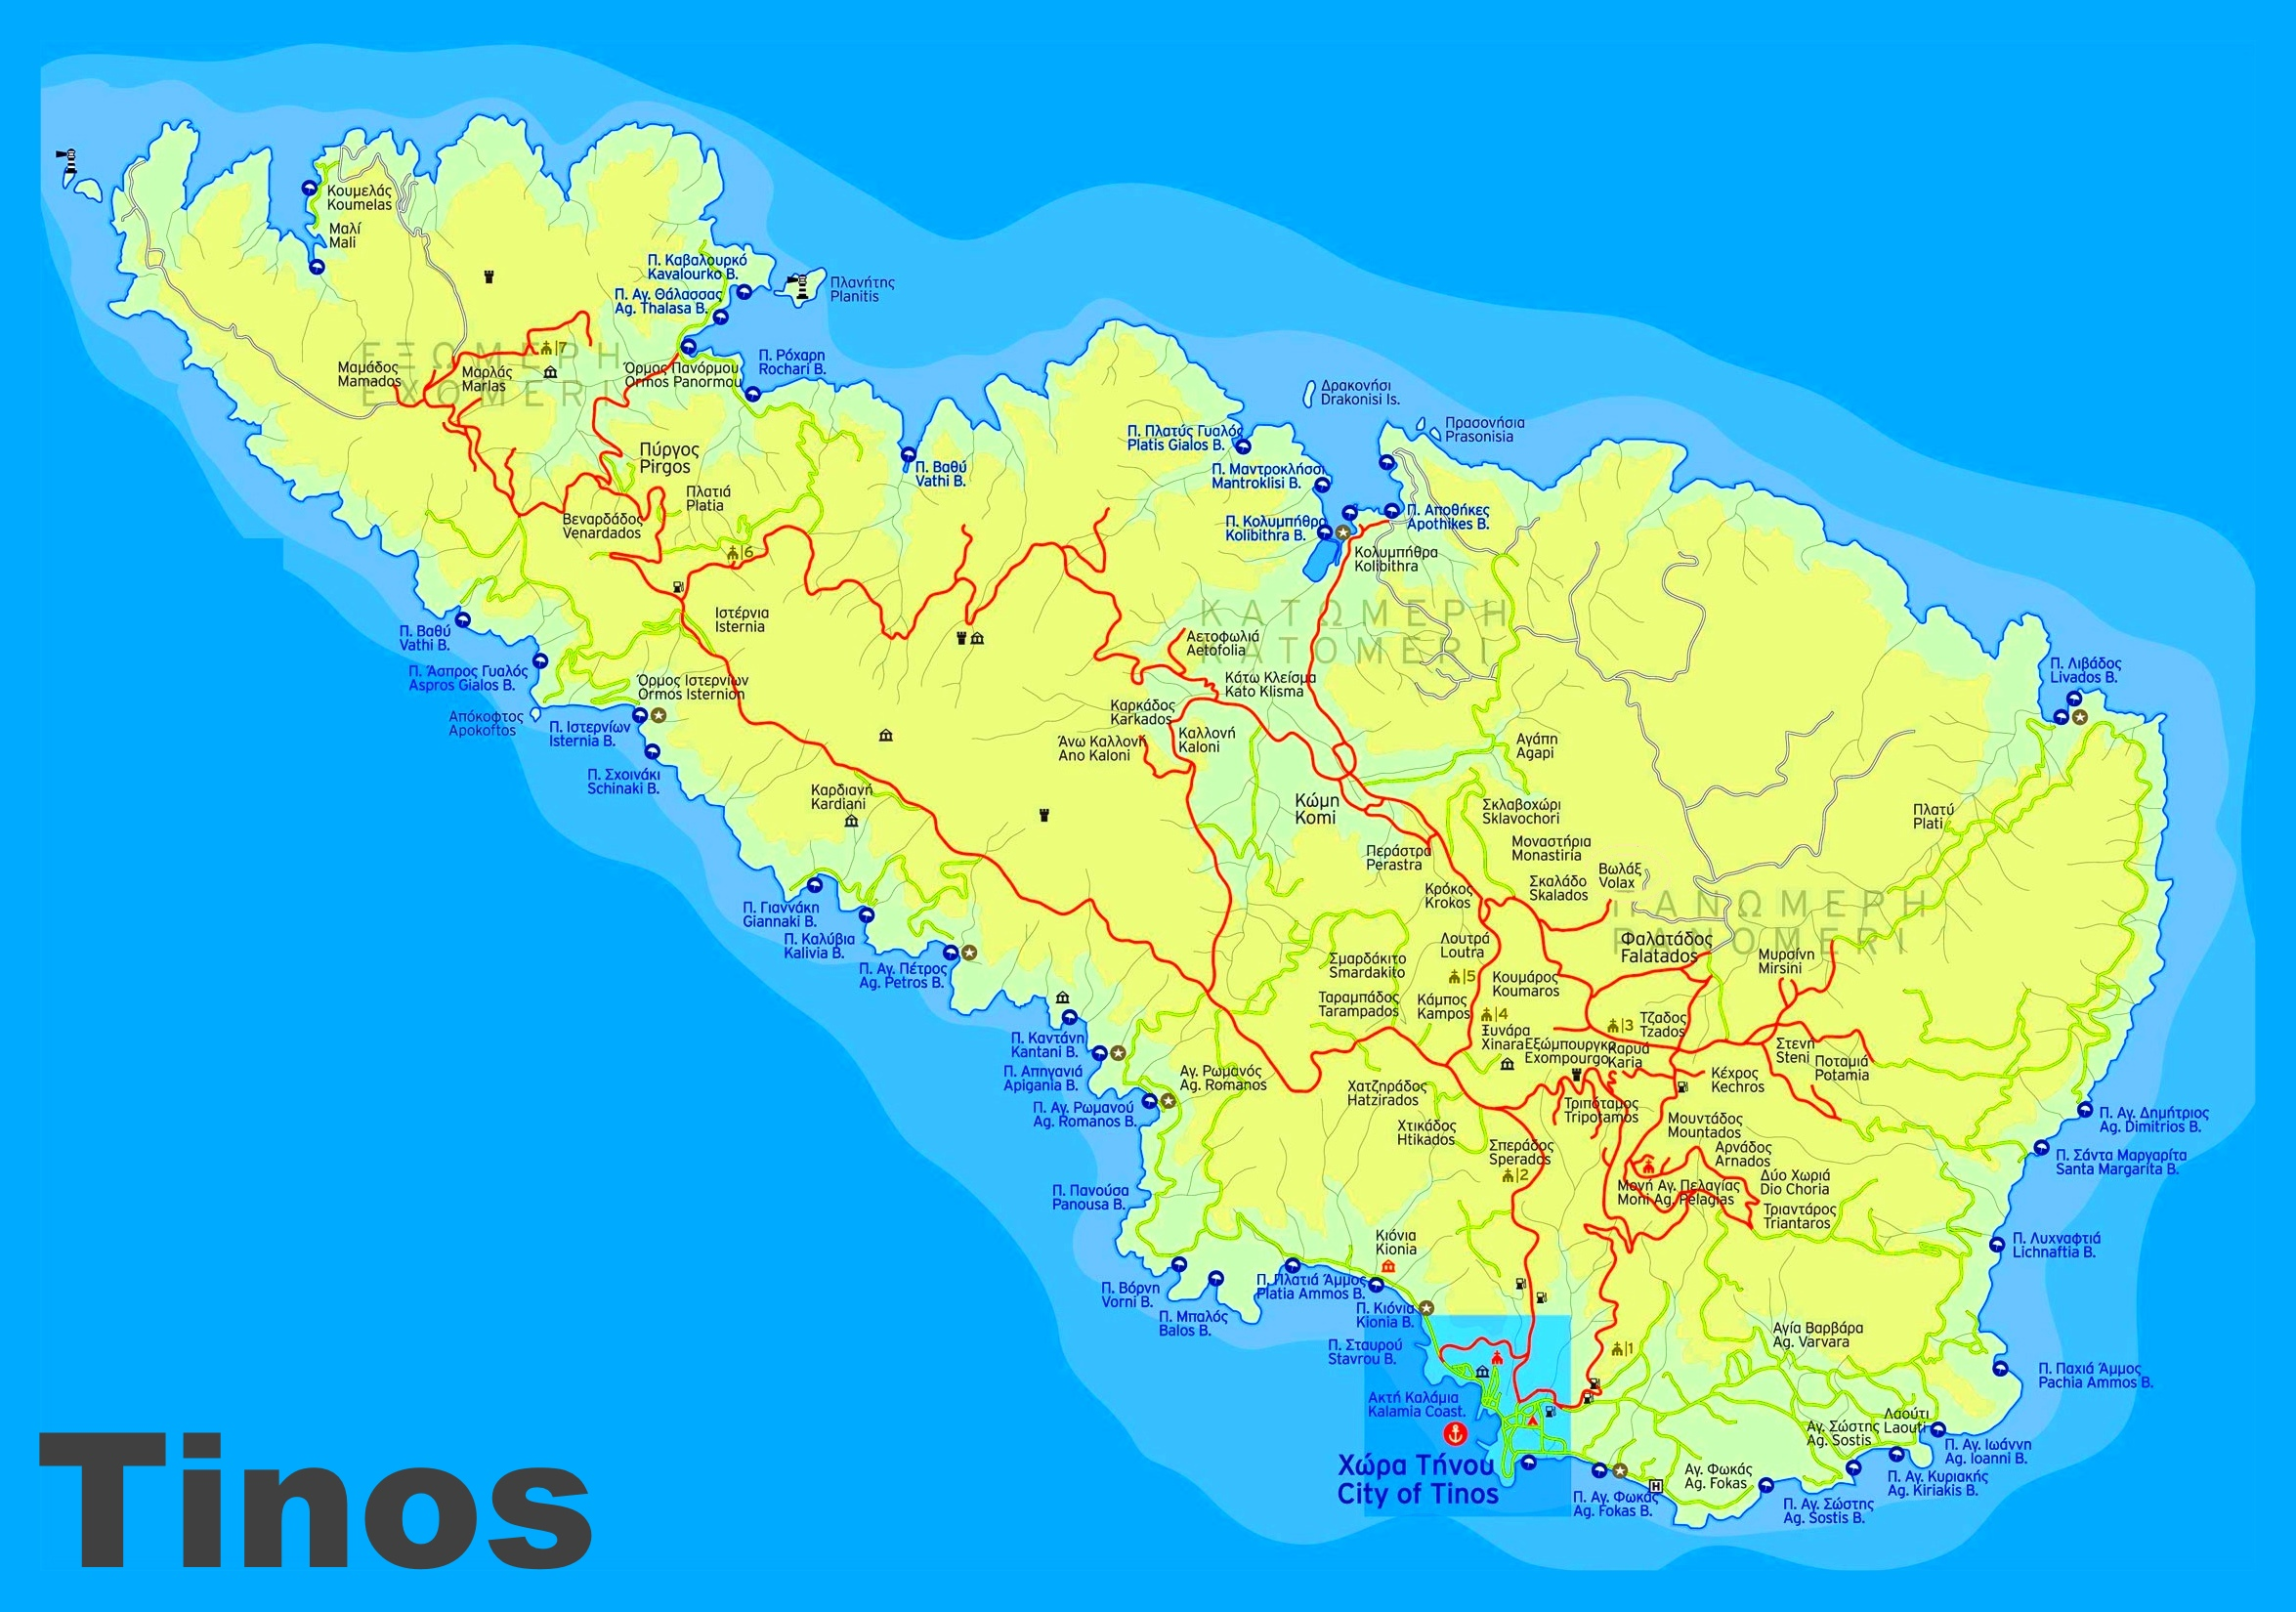 Tinos sightseeing map